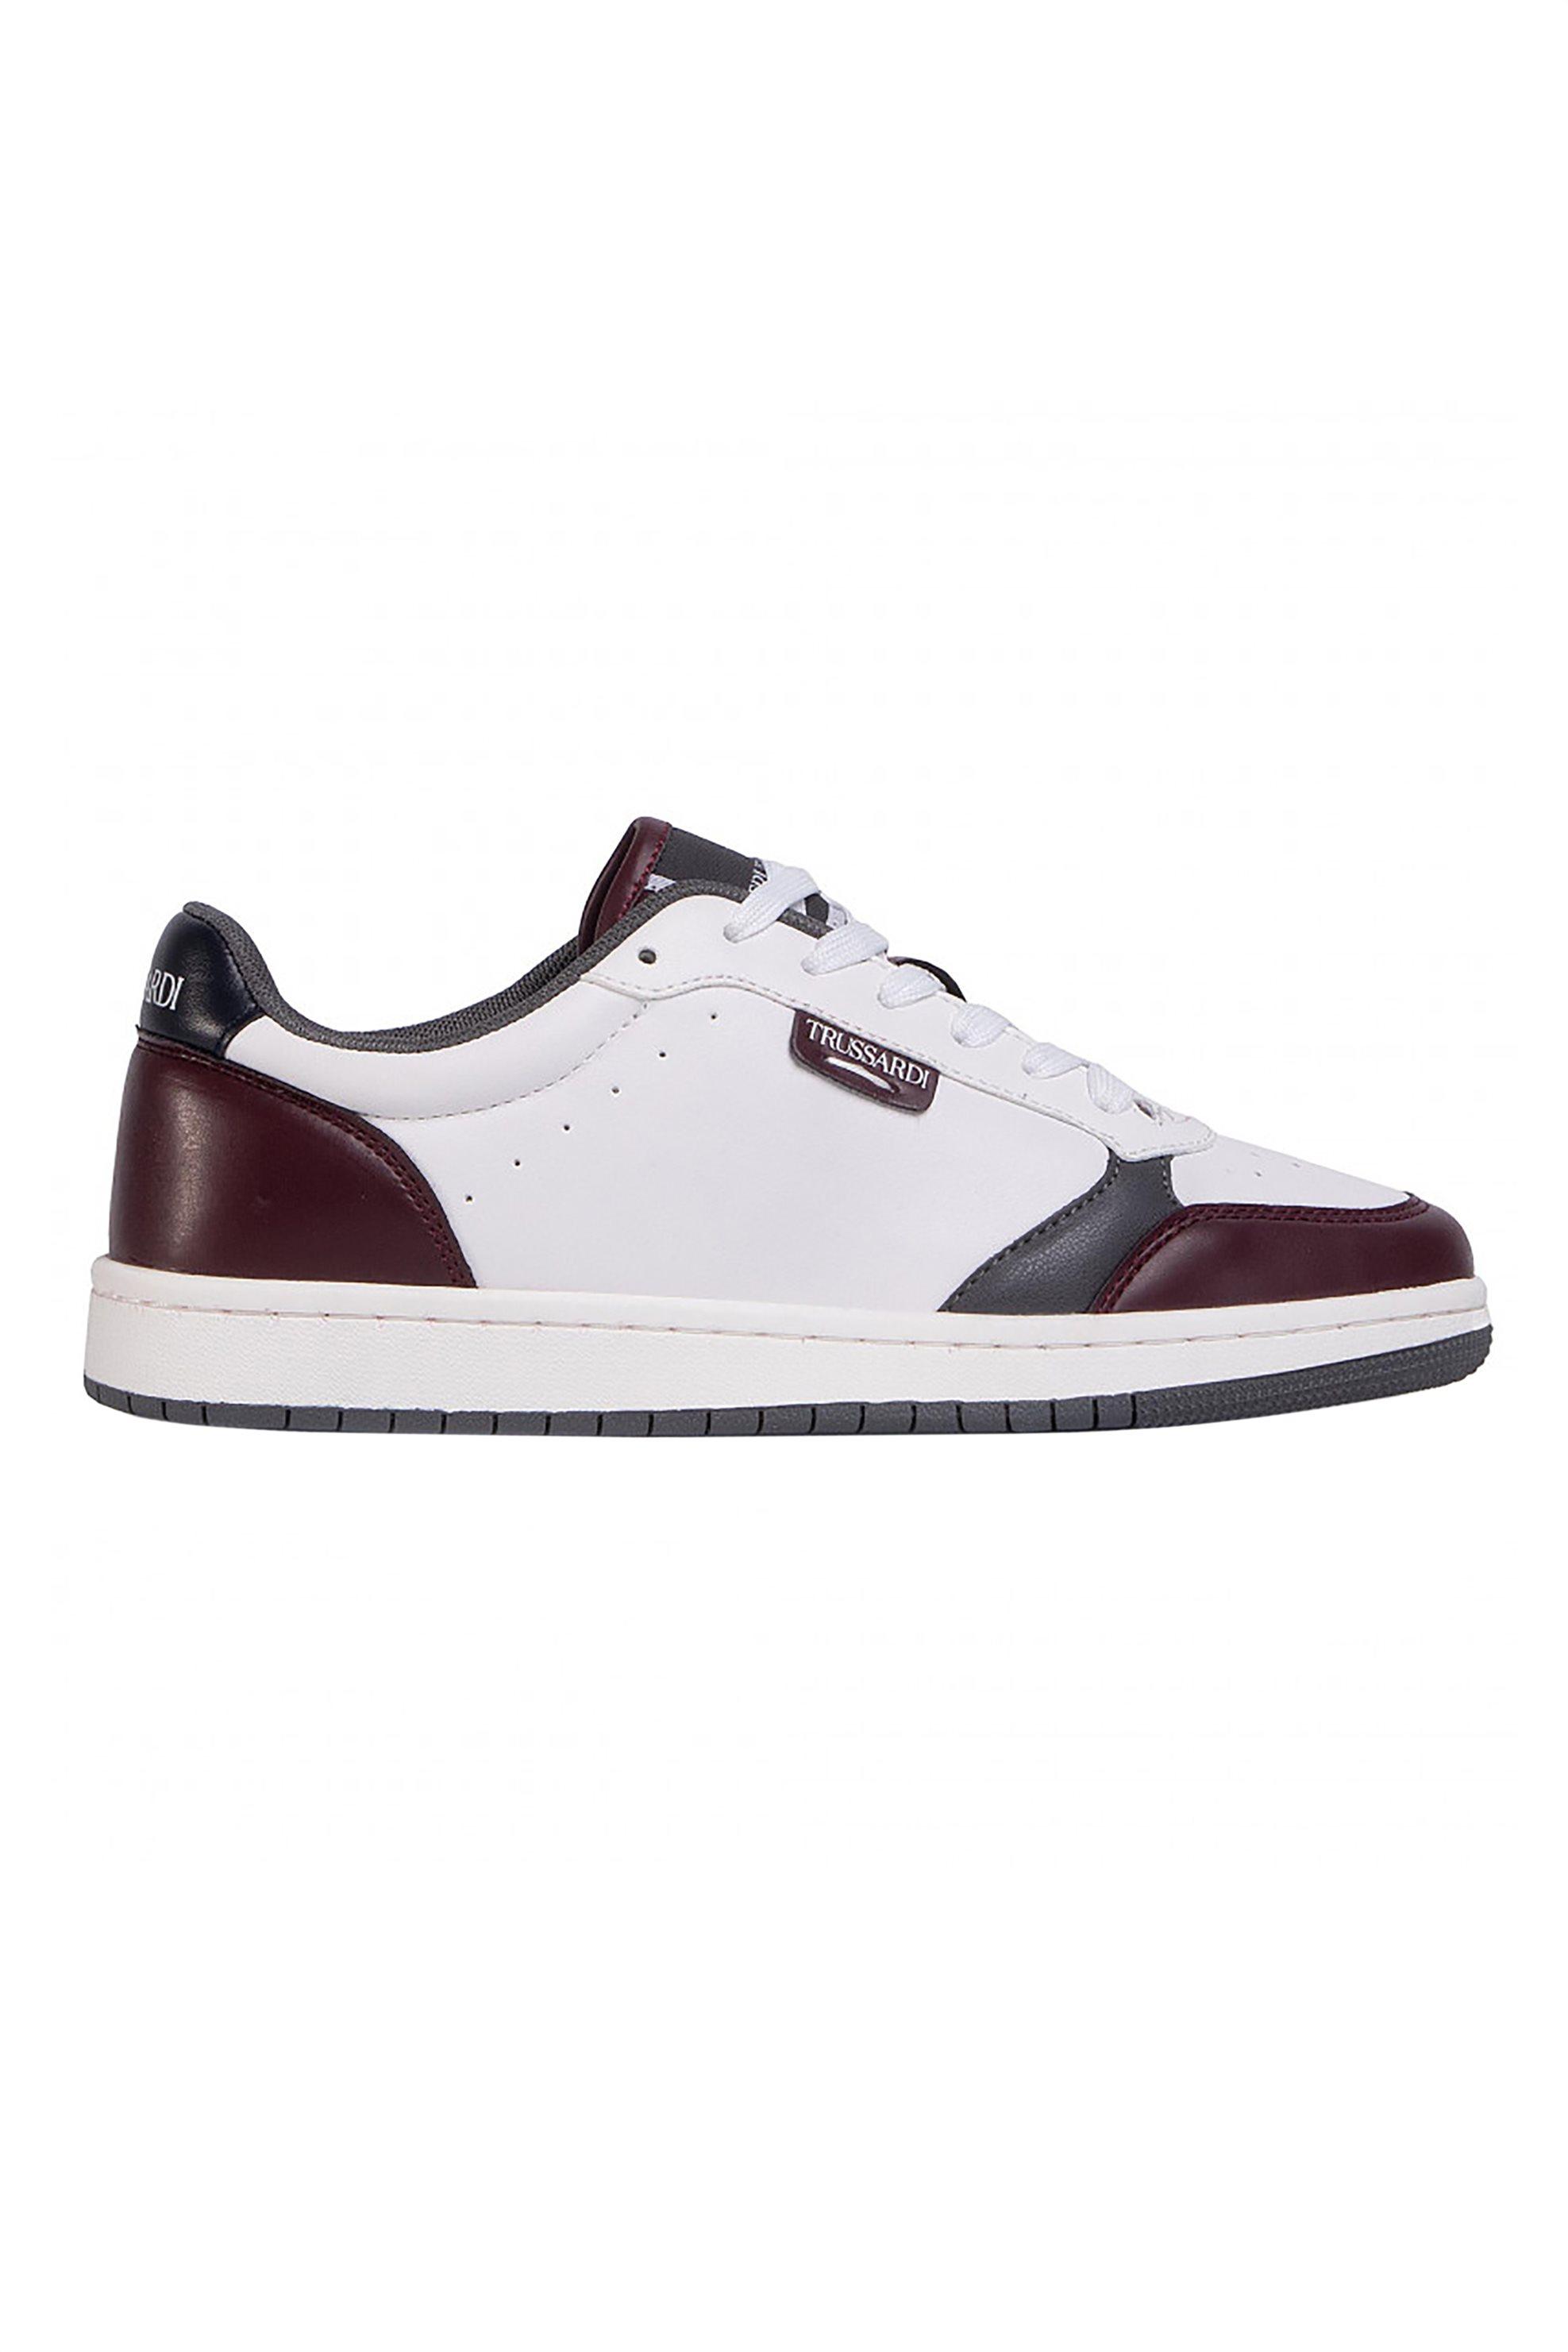 Trussardi Jeans ανδρικά sneakers με διάτρητες λεπτομέρειες - 77A00271-9Y099998 - Μπορντό